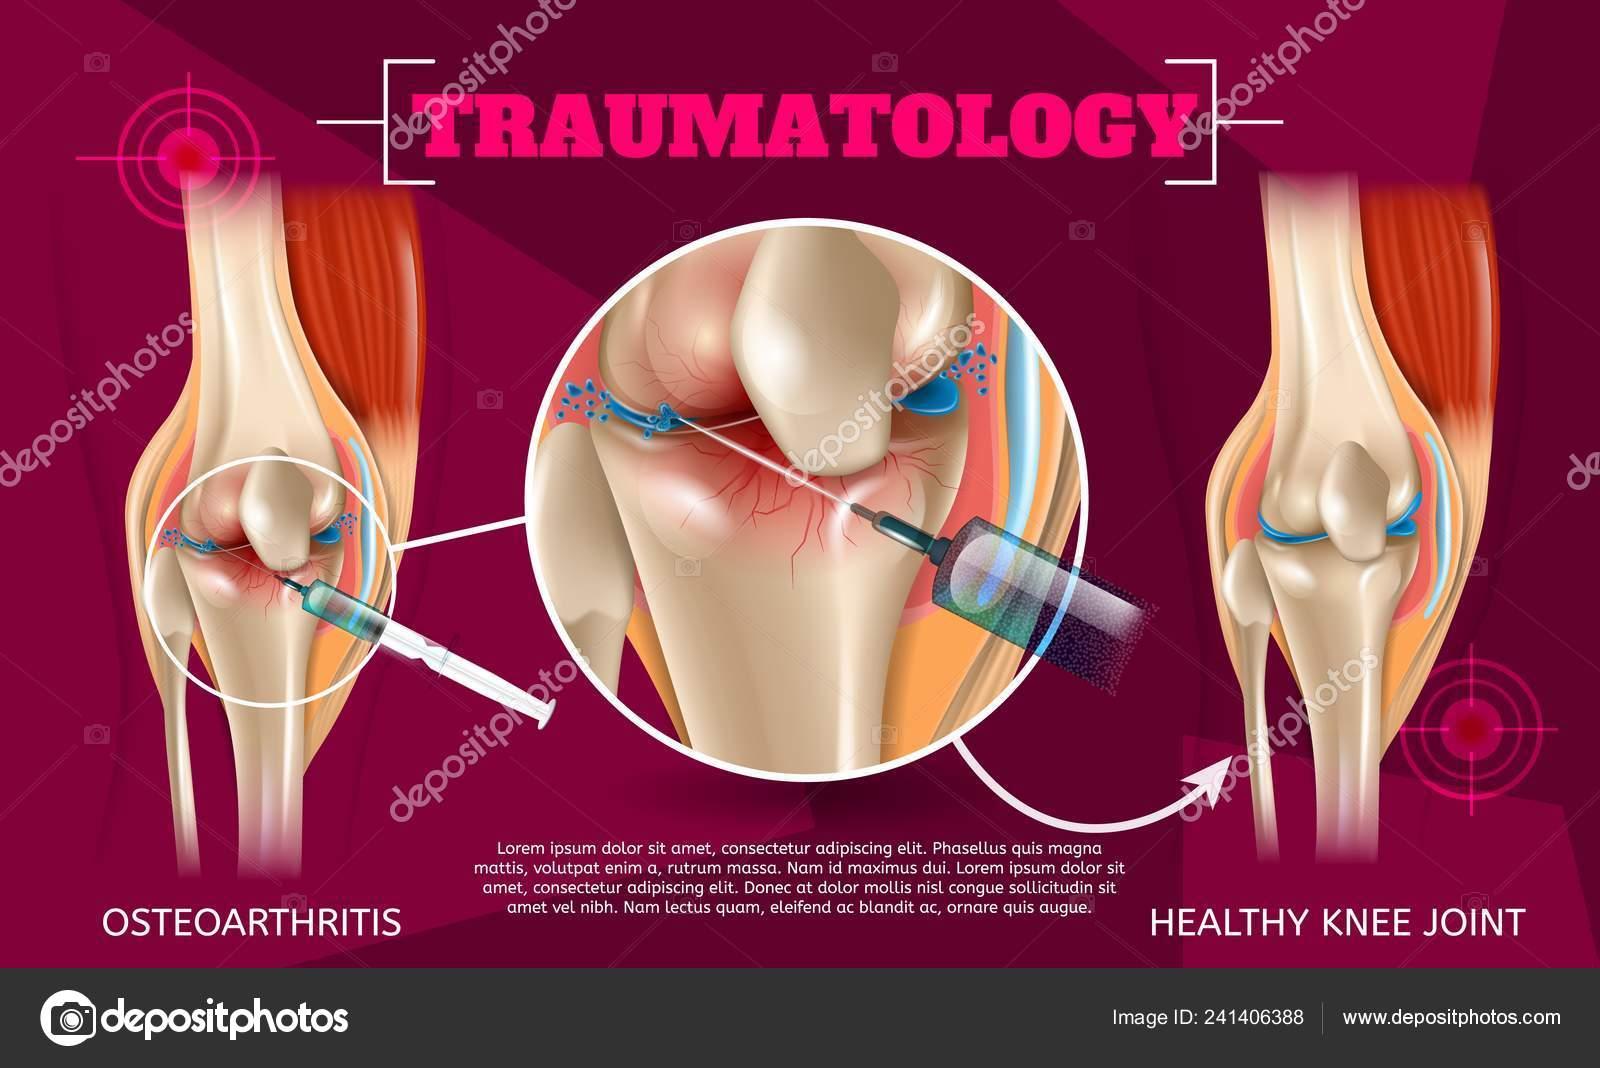 Realistic Illustration Traumatology Medicine Vector Banner Image